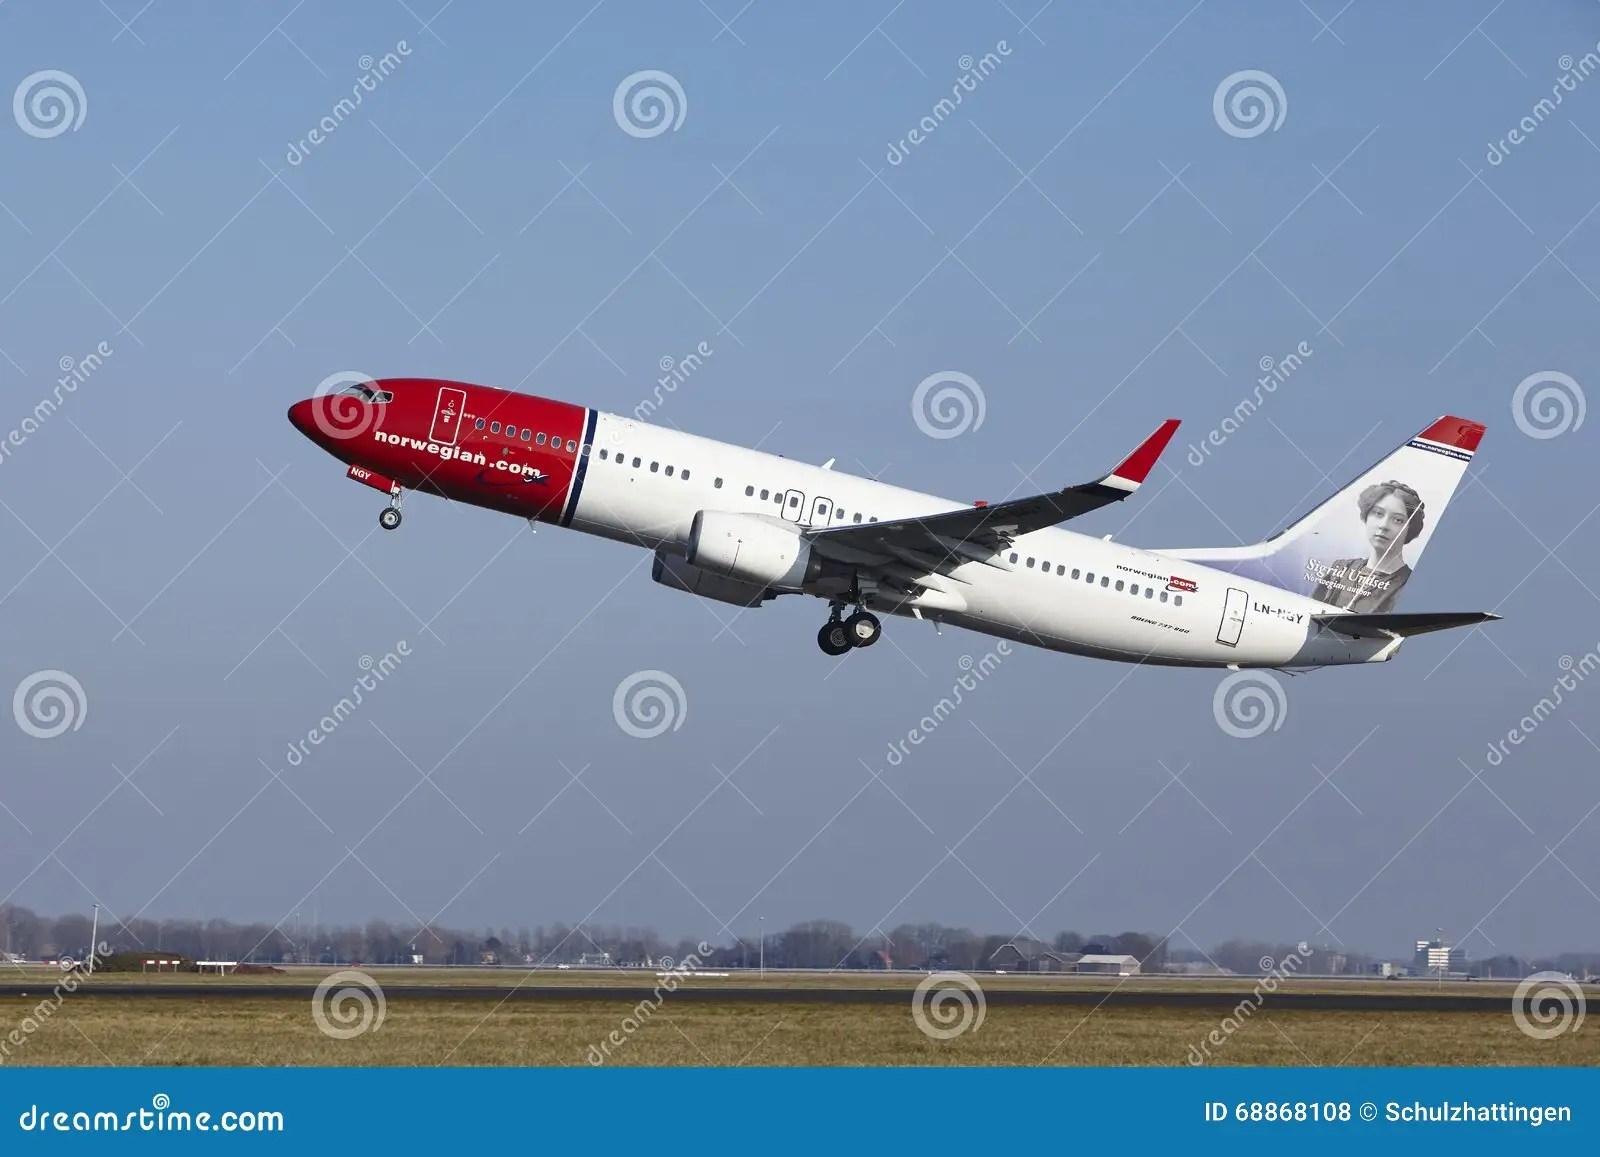 amsterdam airport schiphol norwegian